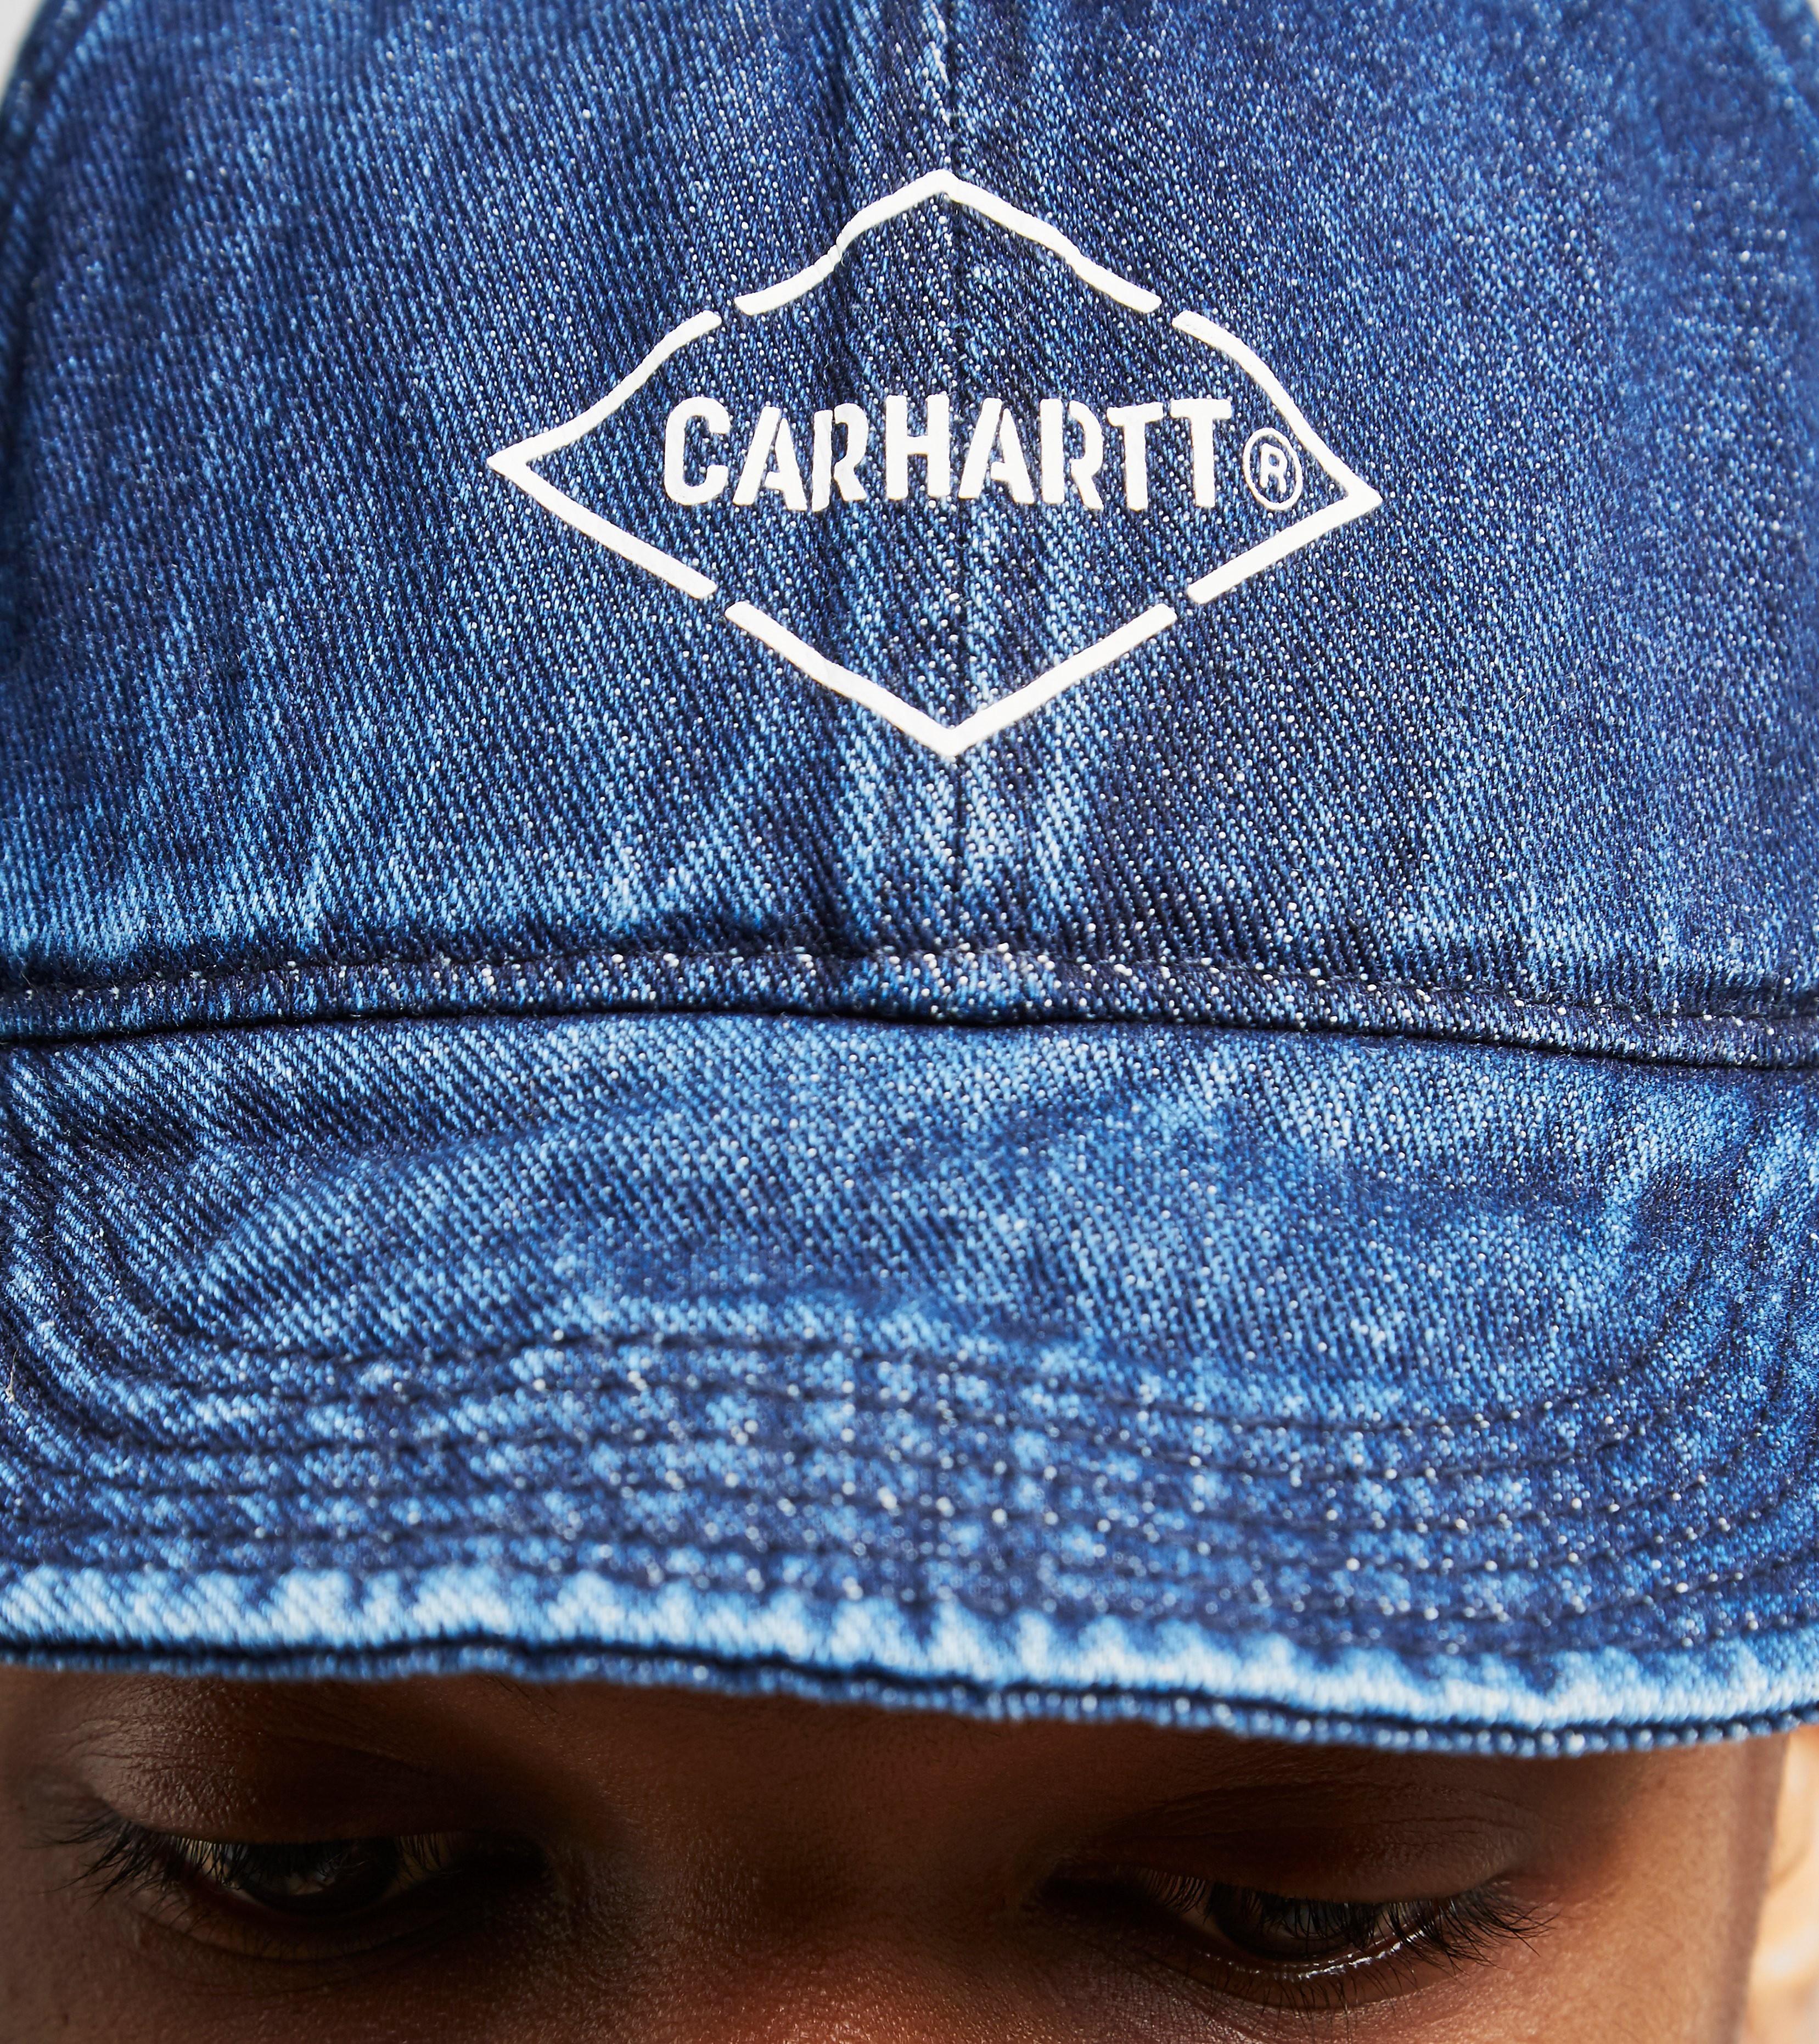 Carhartt WIP Booth 6 Panel Strapback Cap